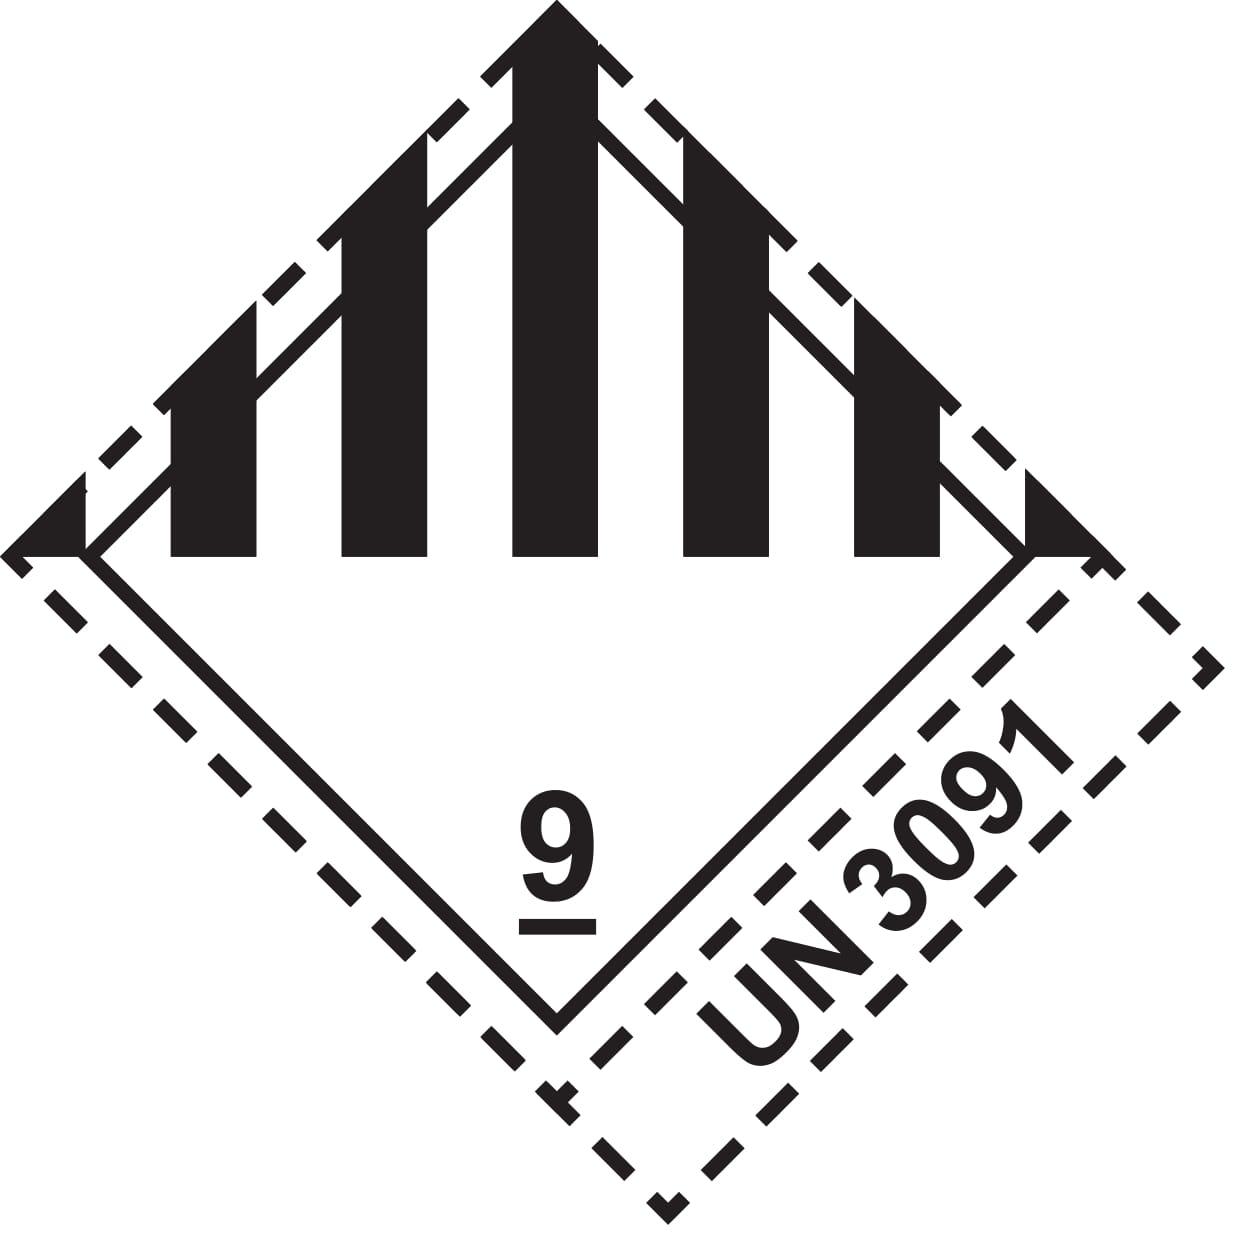 gefahrgut-label-kl9-3091